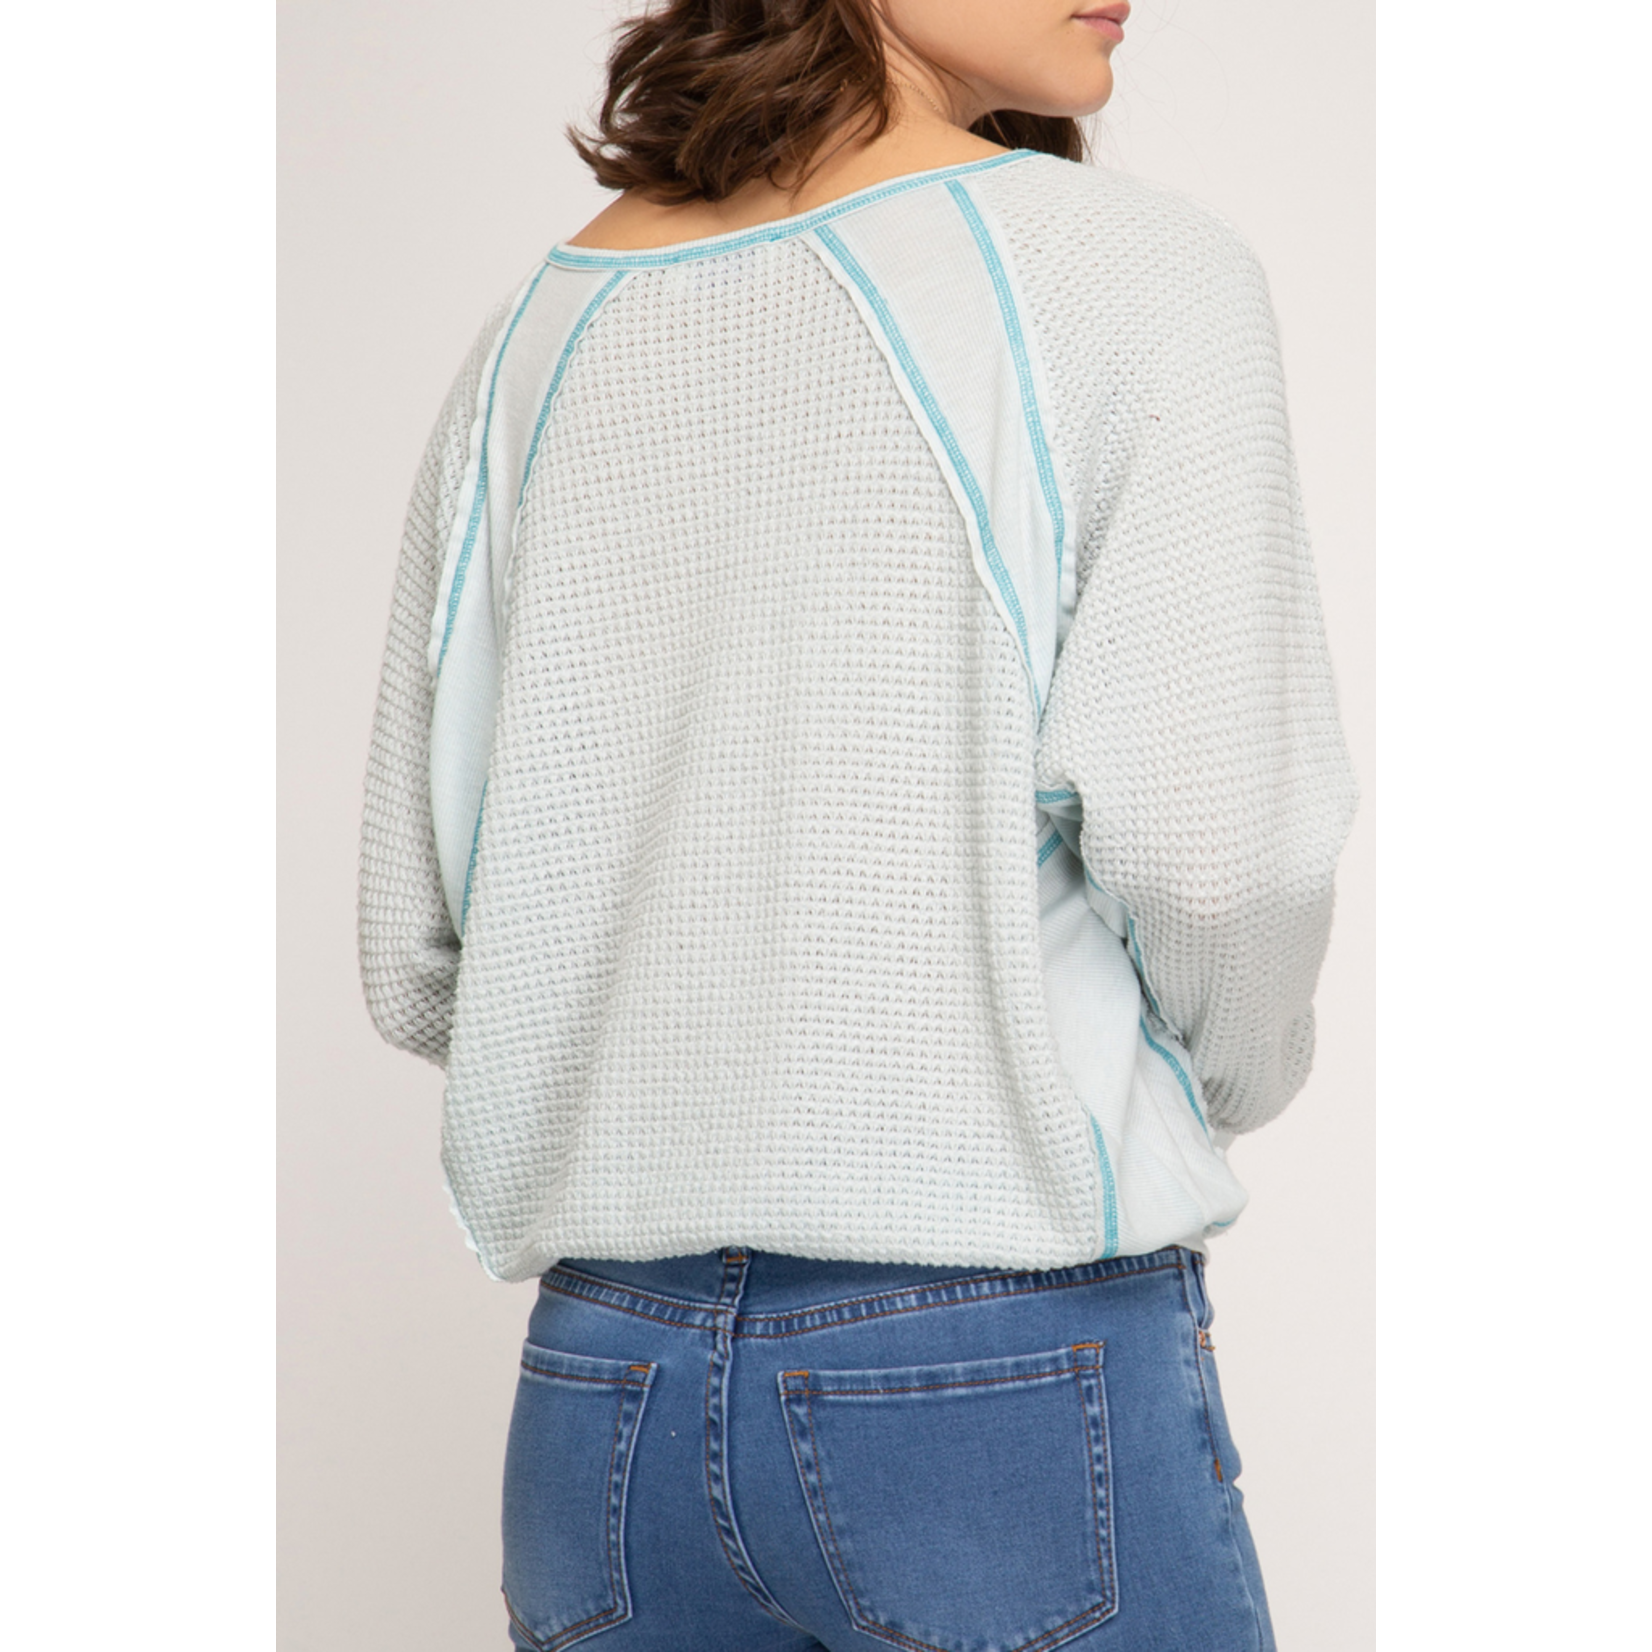 She & Sky V-neck thermal knit top